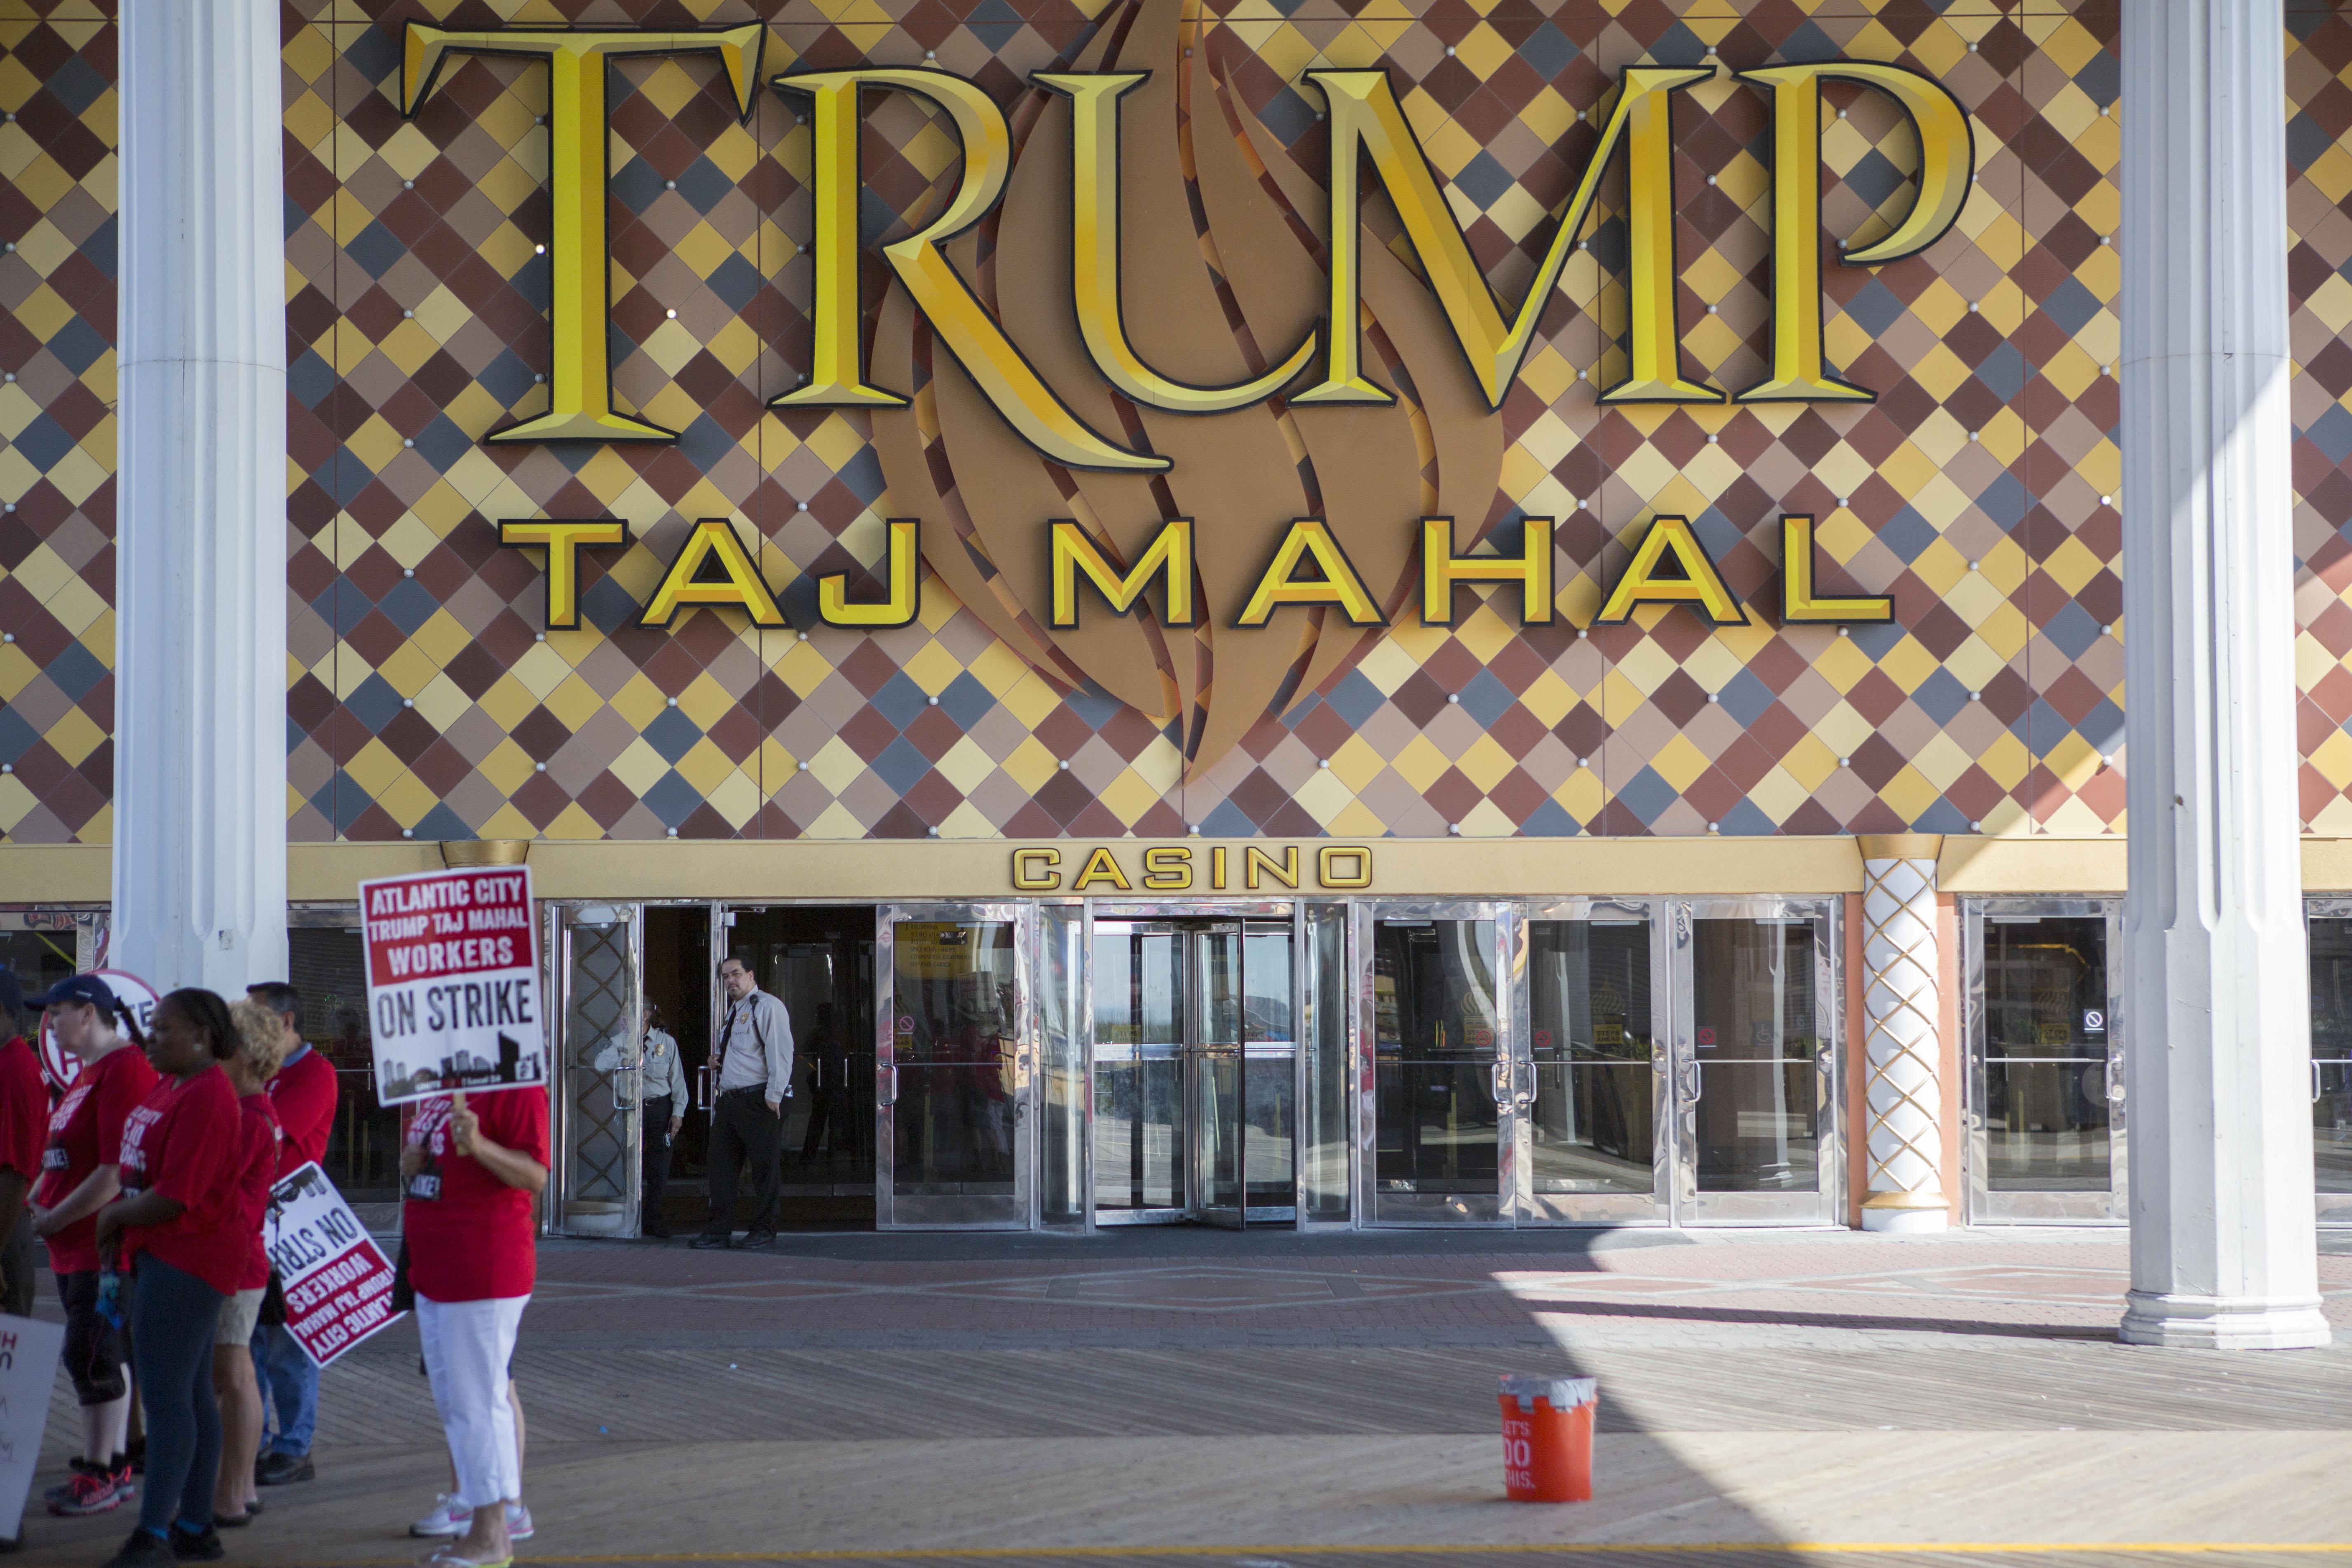 Unite Here local 54 casino worker's union members protest outside Trump Taj Mahal casino on July 6, 2016 in Atlantic City, New Jersey.